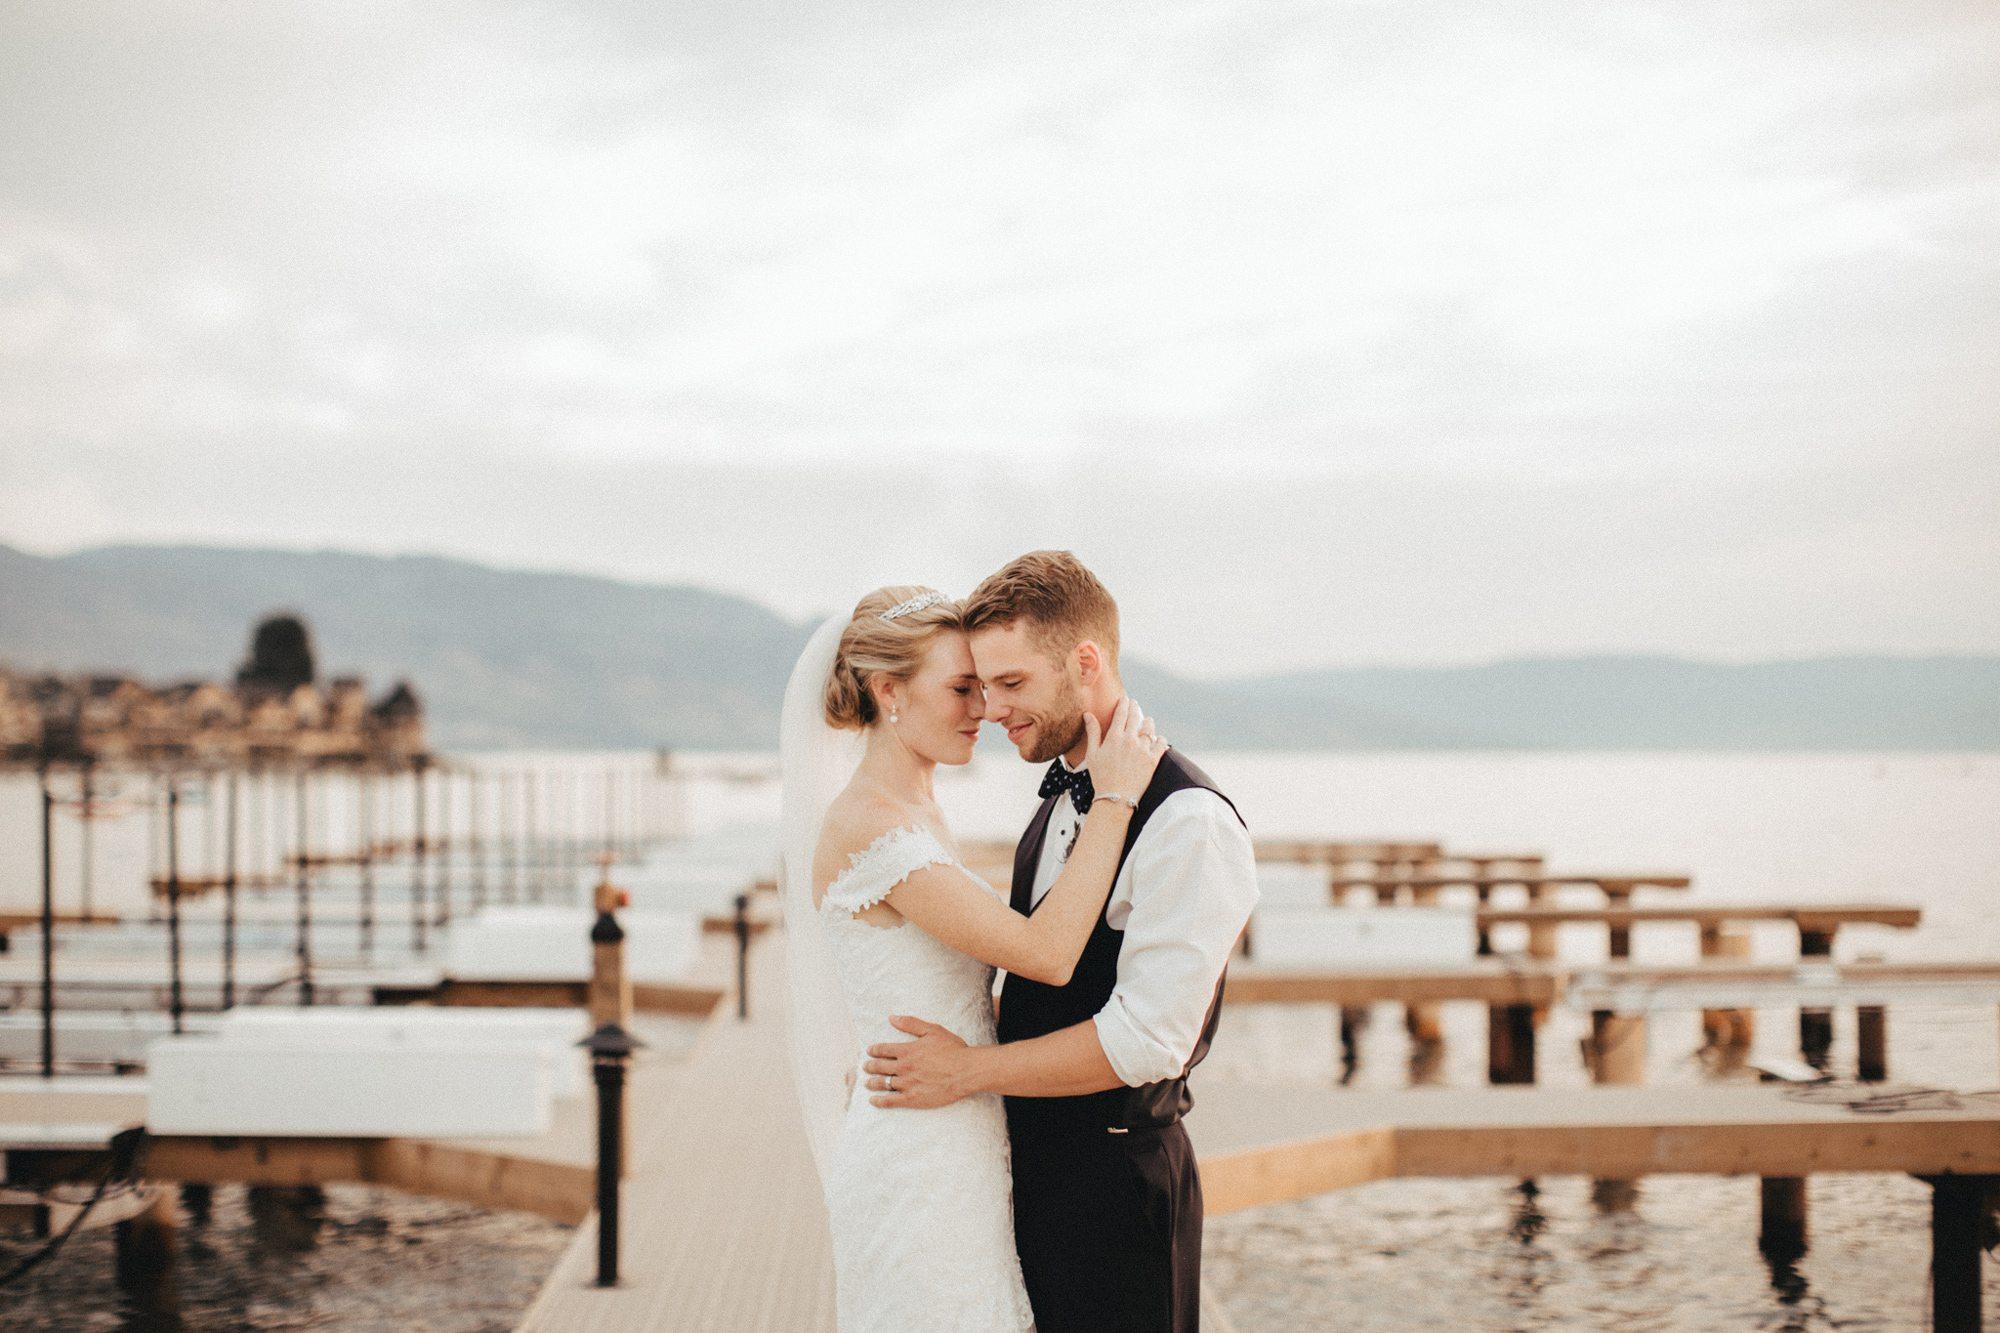 308-kelowna-wedding-photographer